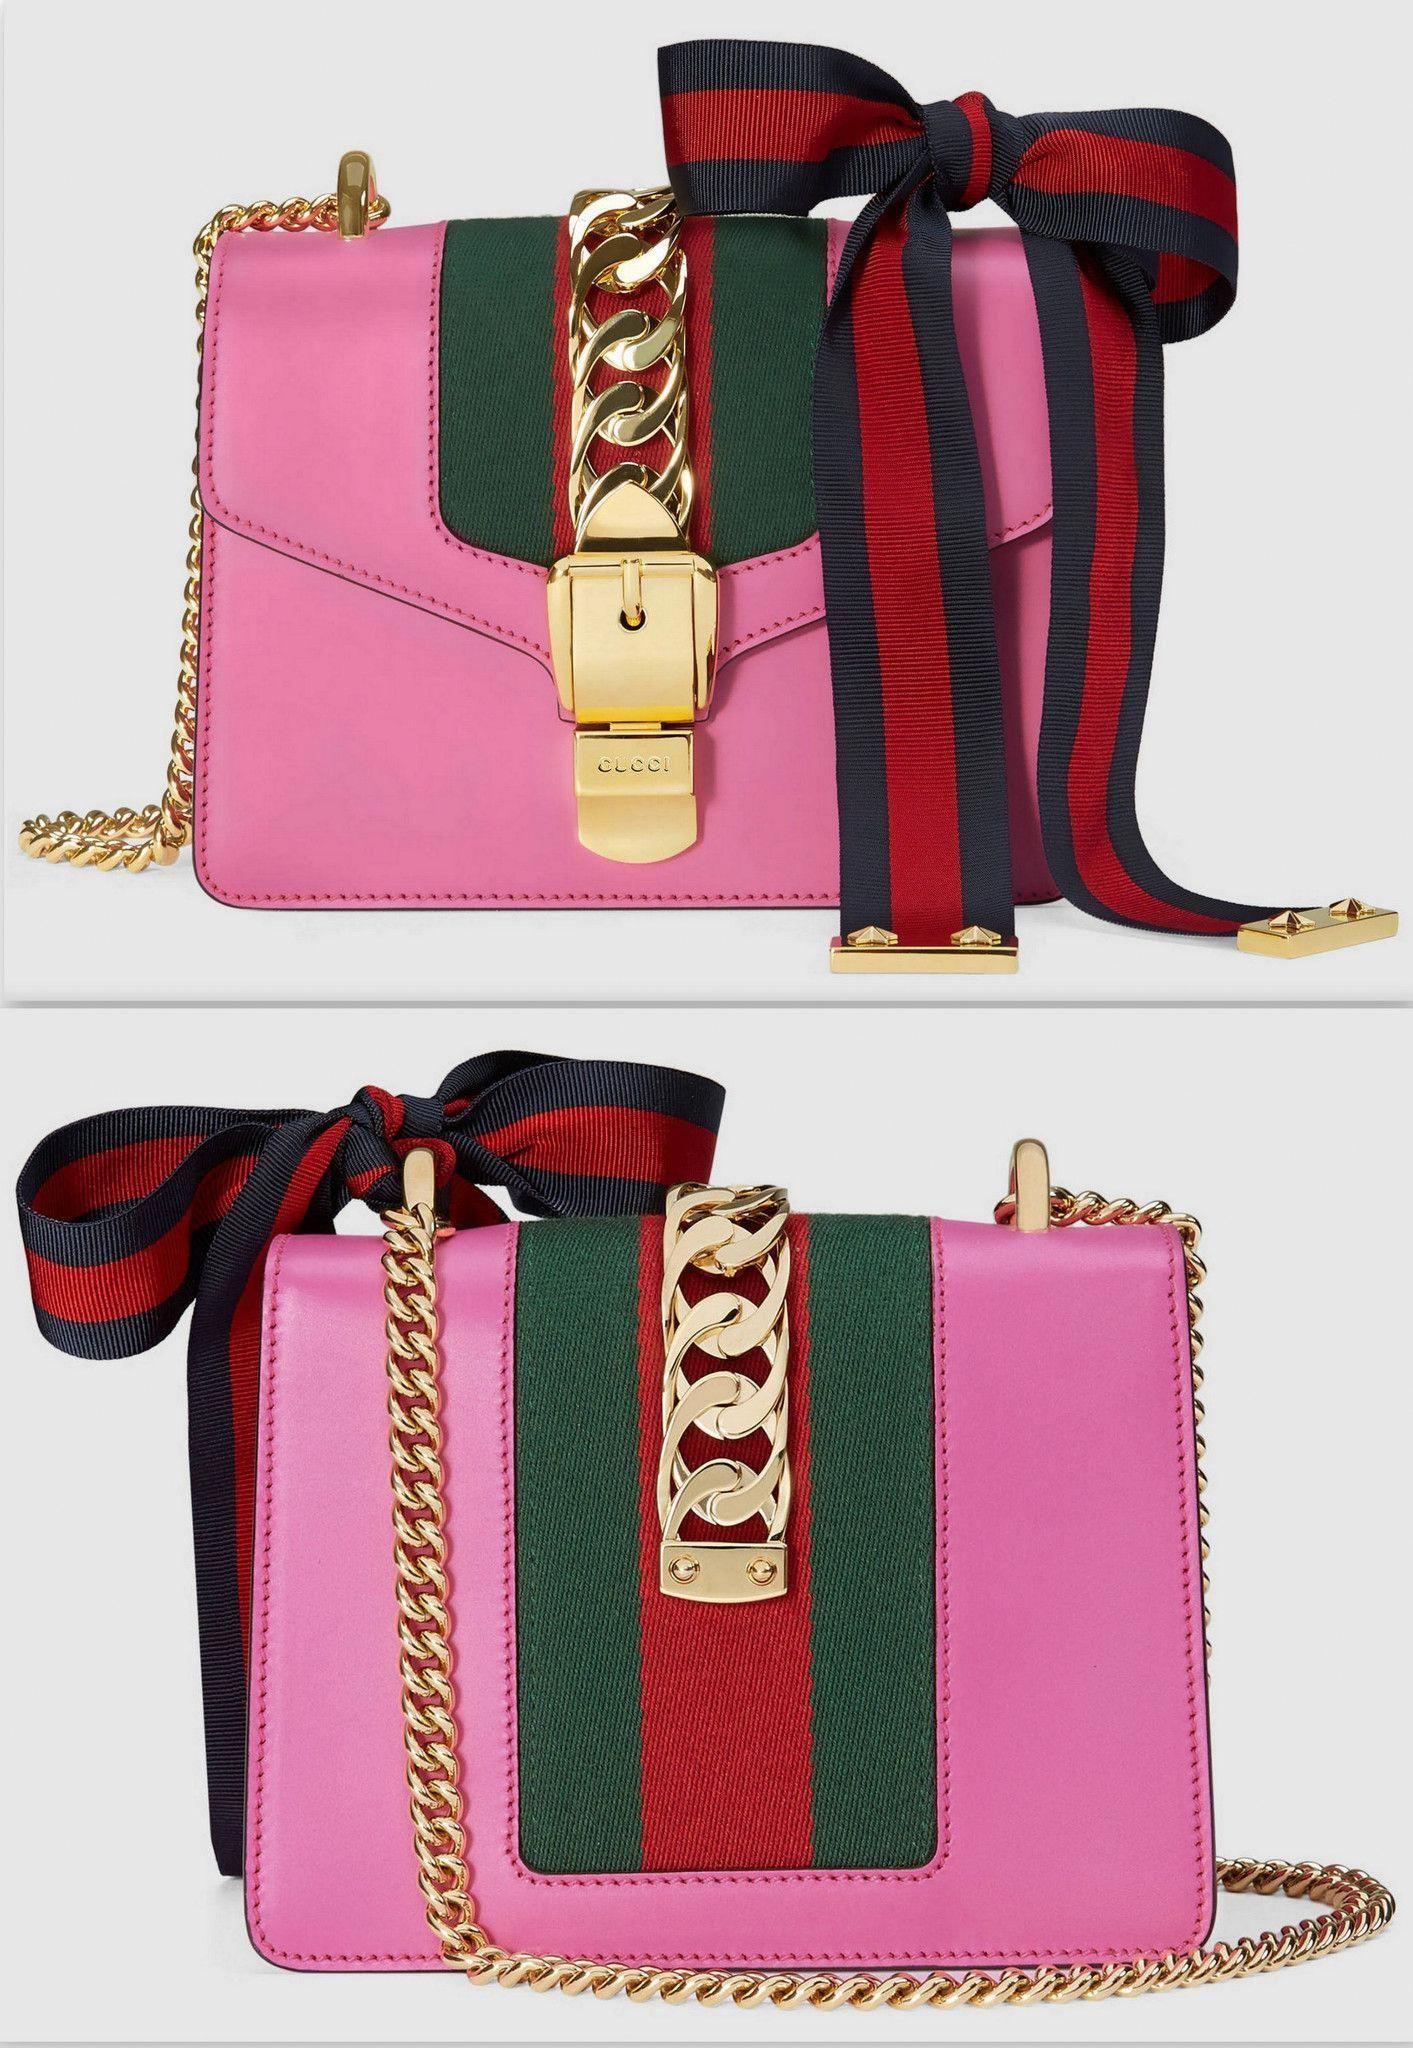 7f1fc6ec9 Sylvie' Leather Mini Chain Bag, Pink #Guccihandbags | Gucci handbags ...